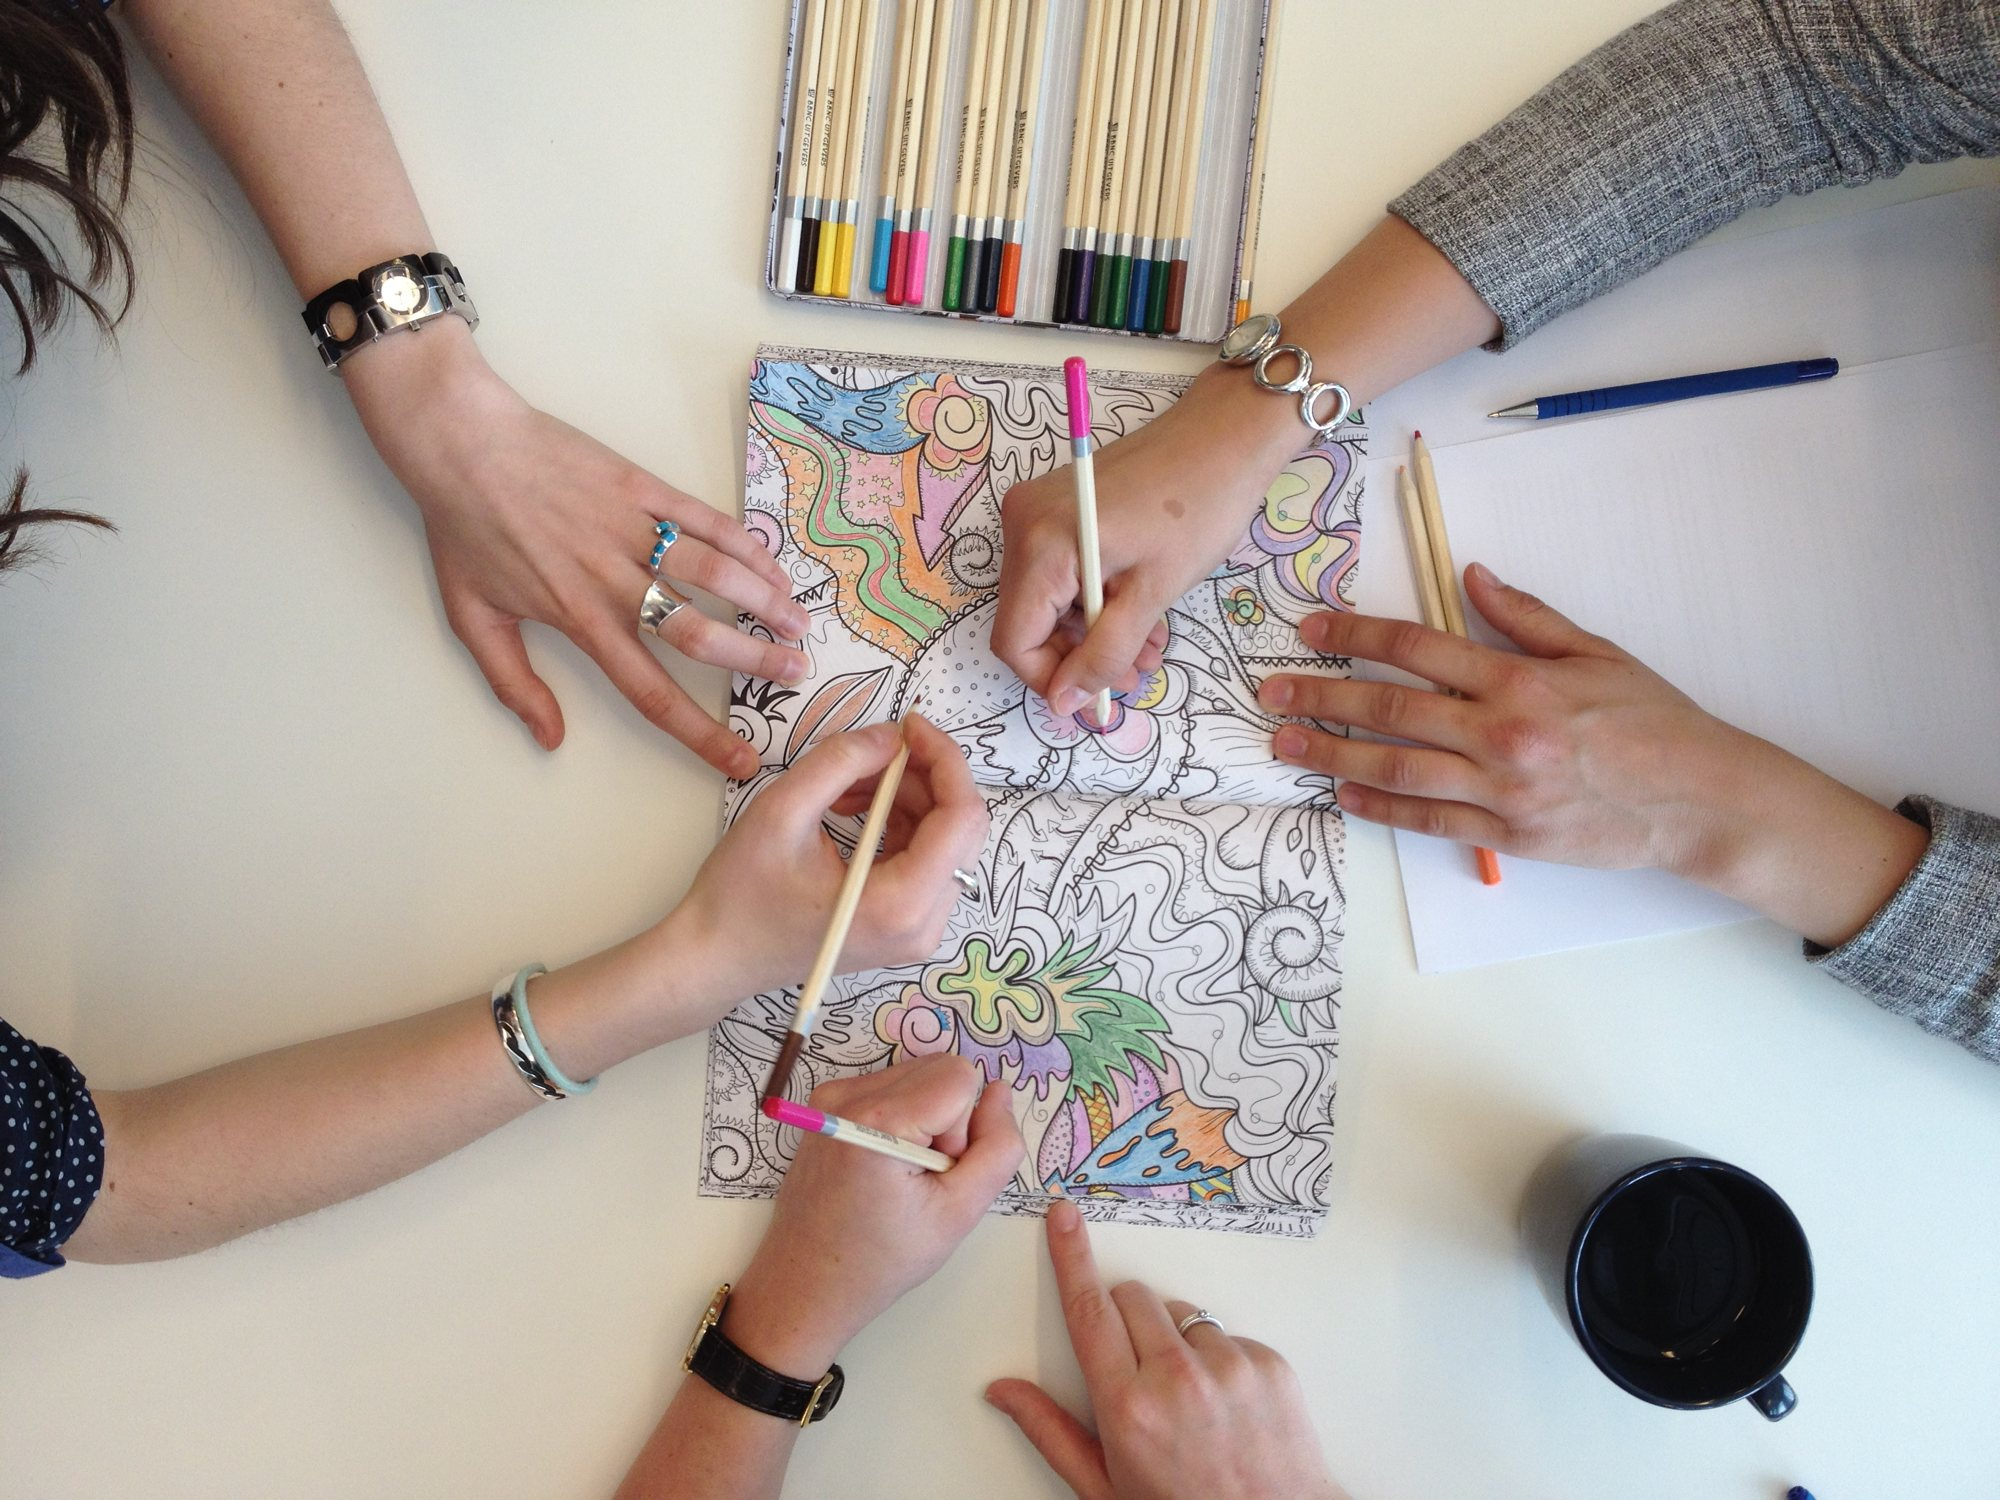 La moda de colorear para adultos llega a internet 12 webs Colouring books for adults dymocks